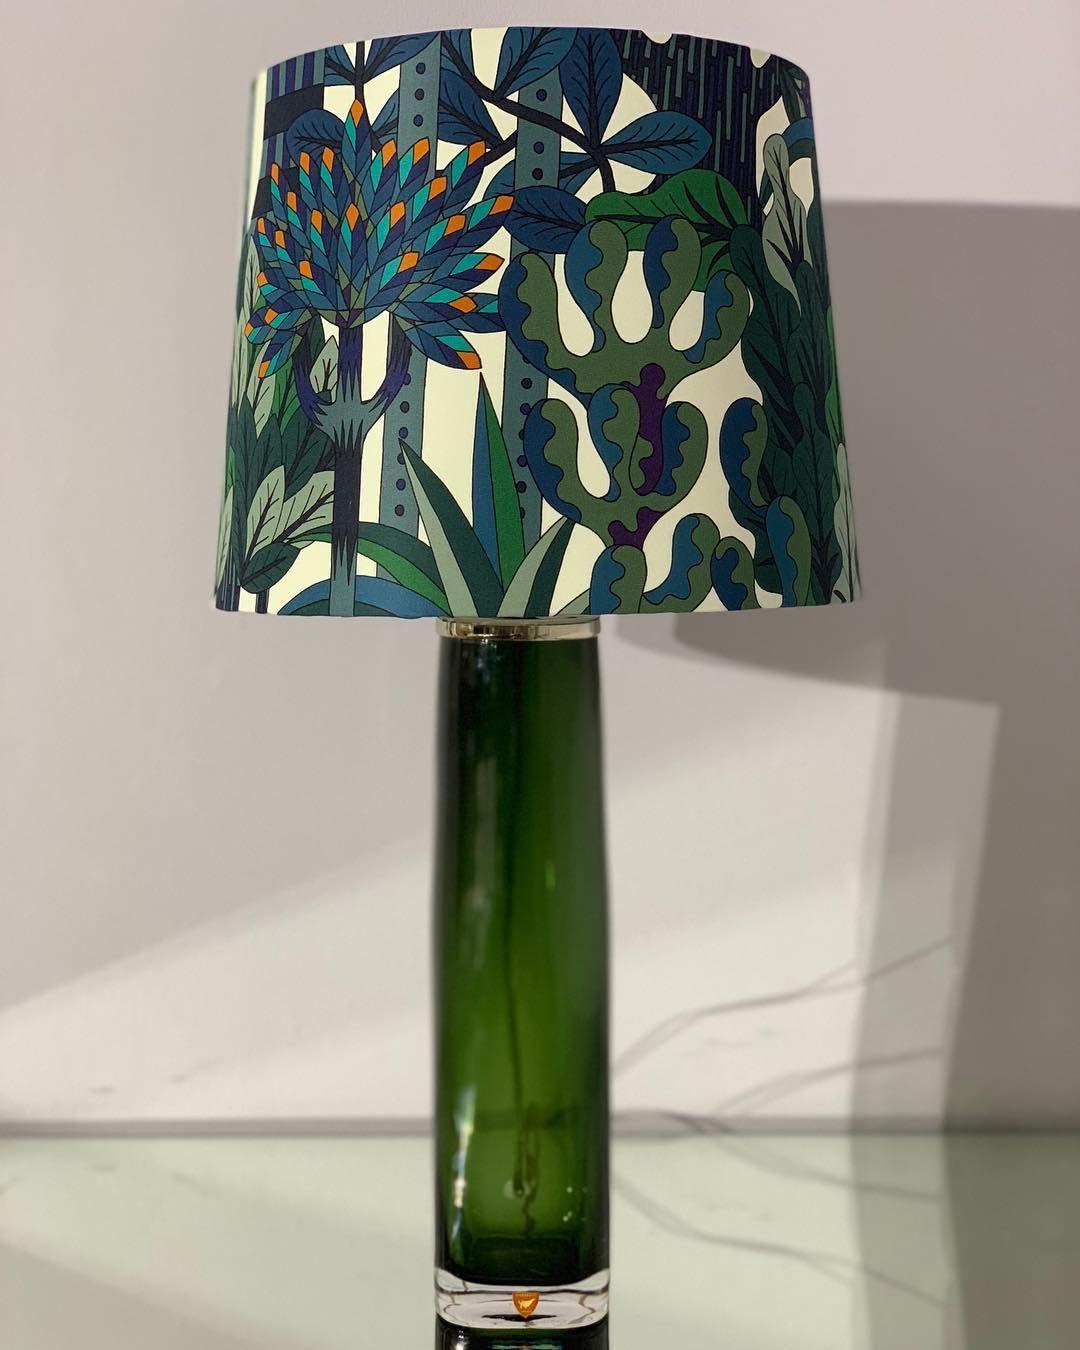 Carl Fagerlund Orrefors Hermes Lampshade Molamps Lamp Lamp Shade Novelty Lamp